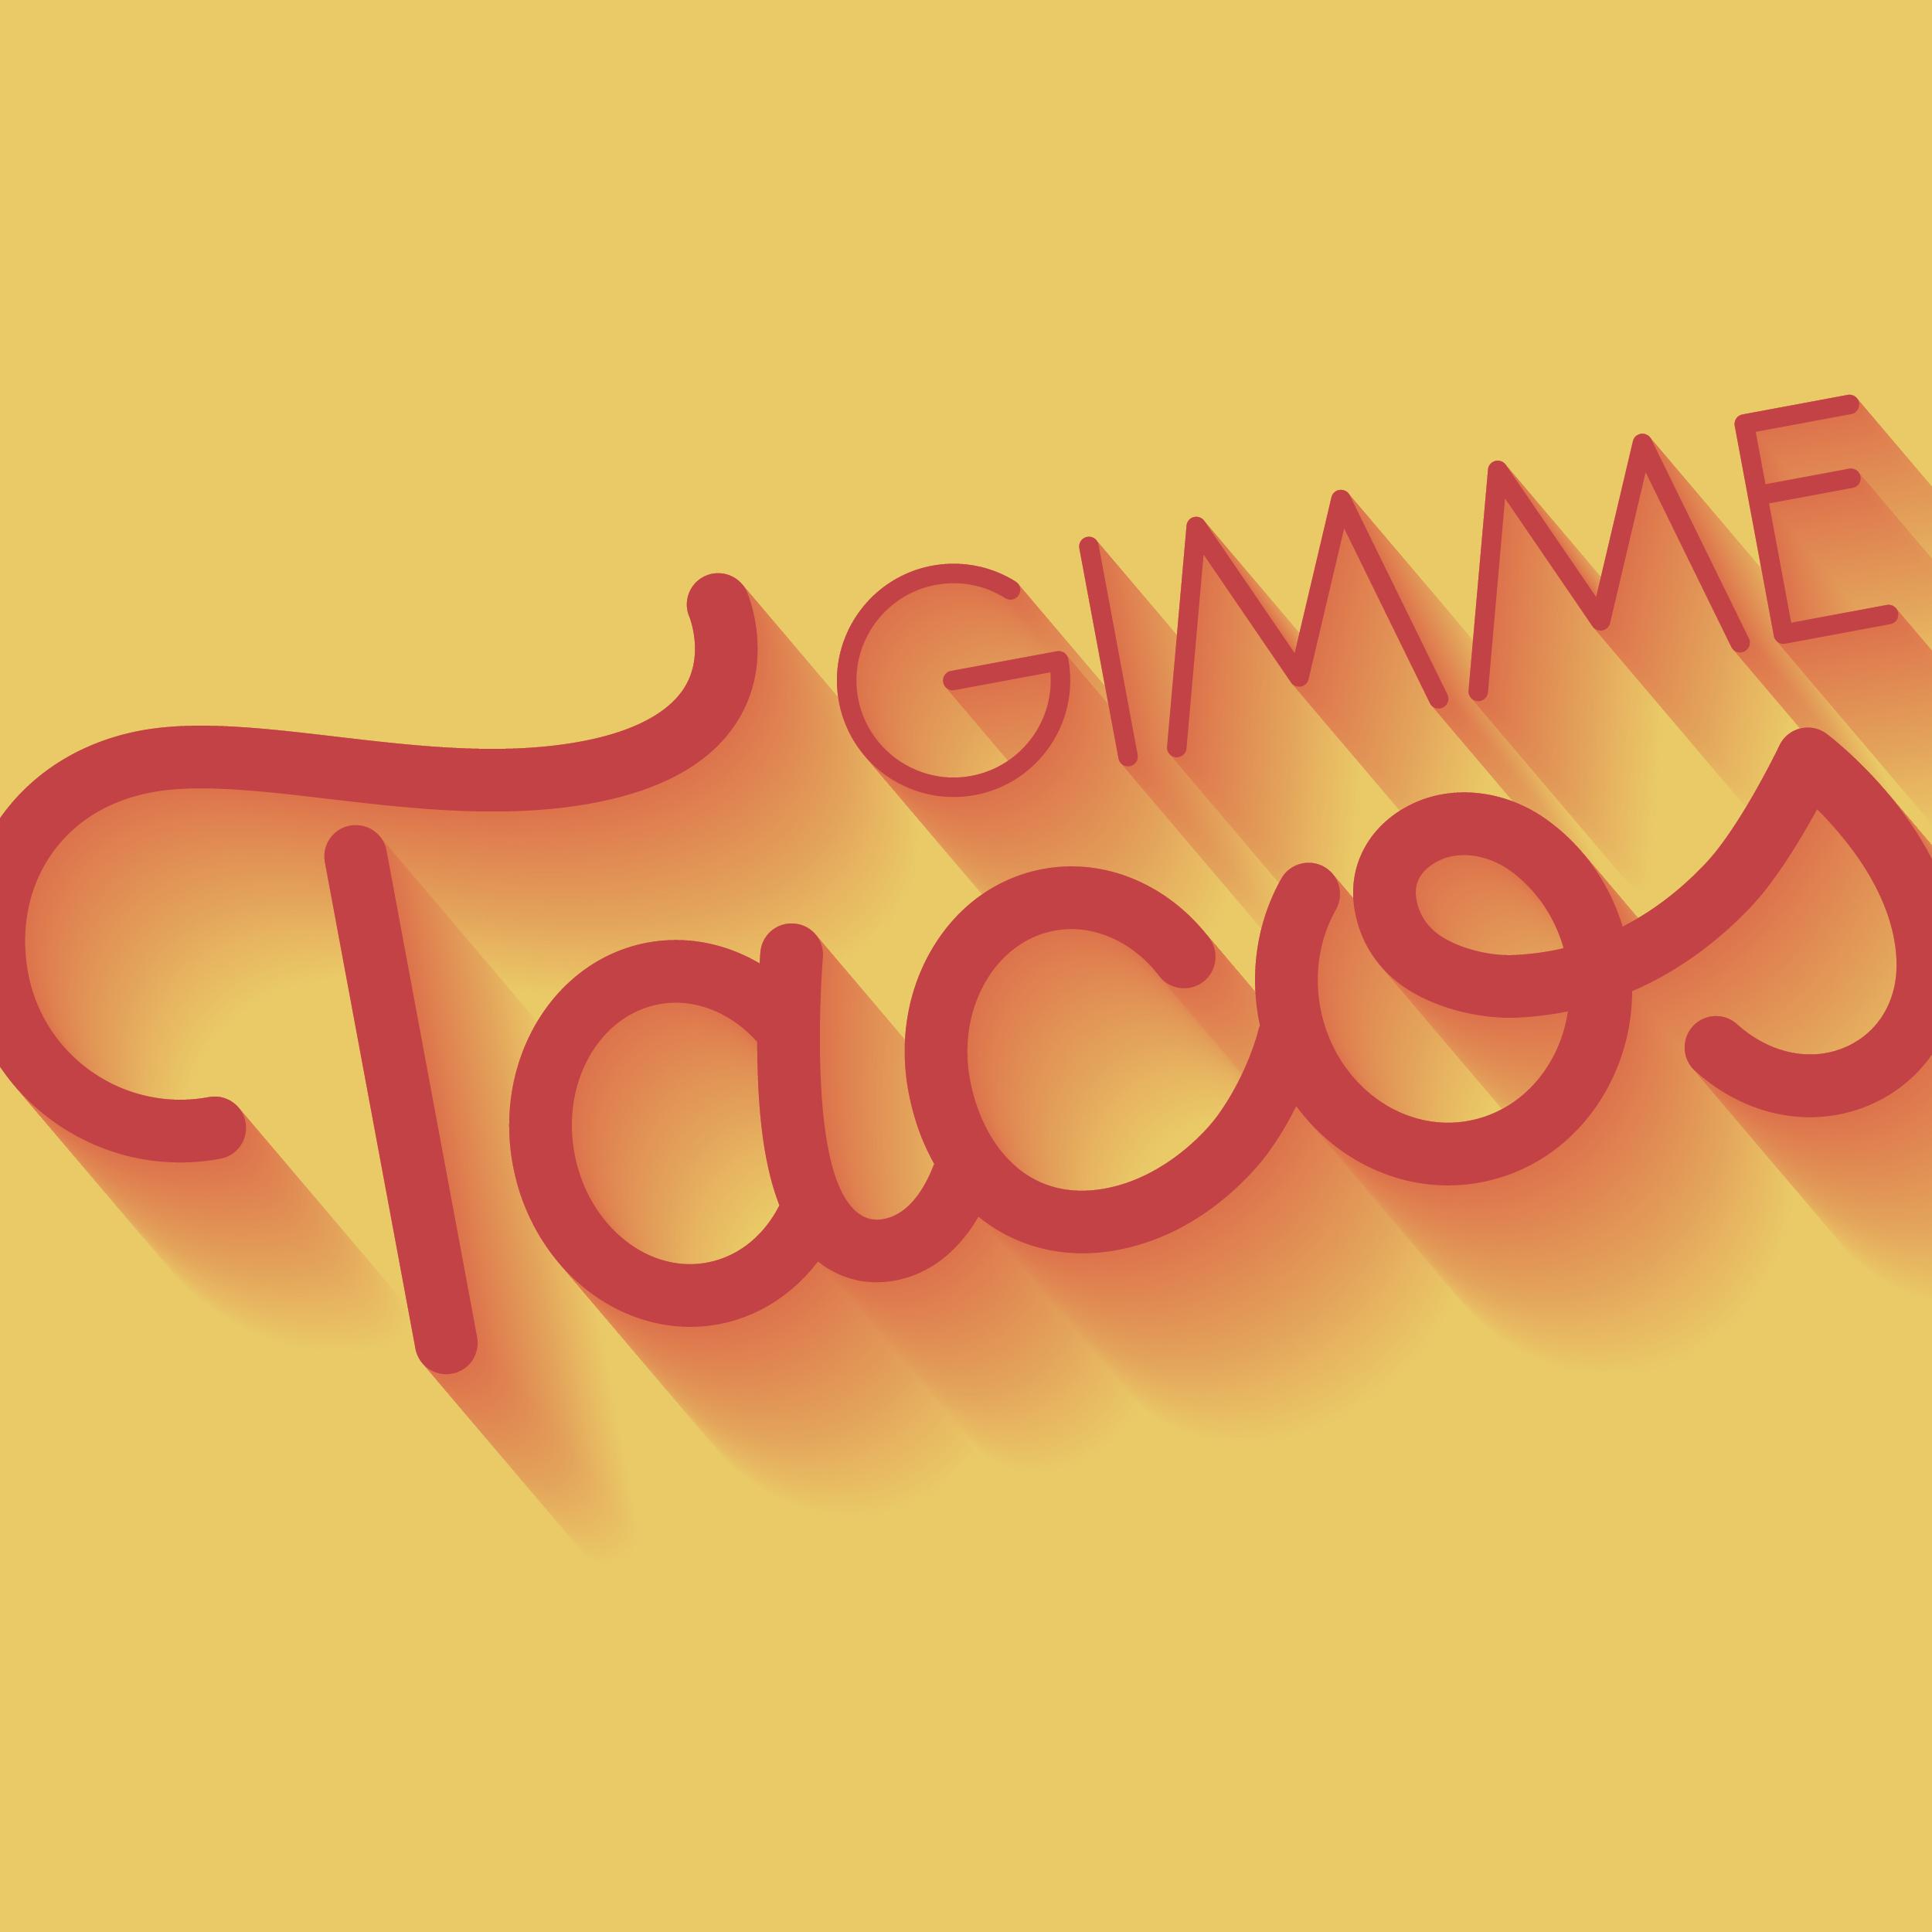 GimmeTacos-01.jpg